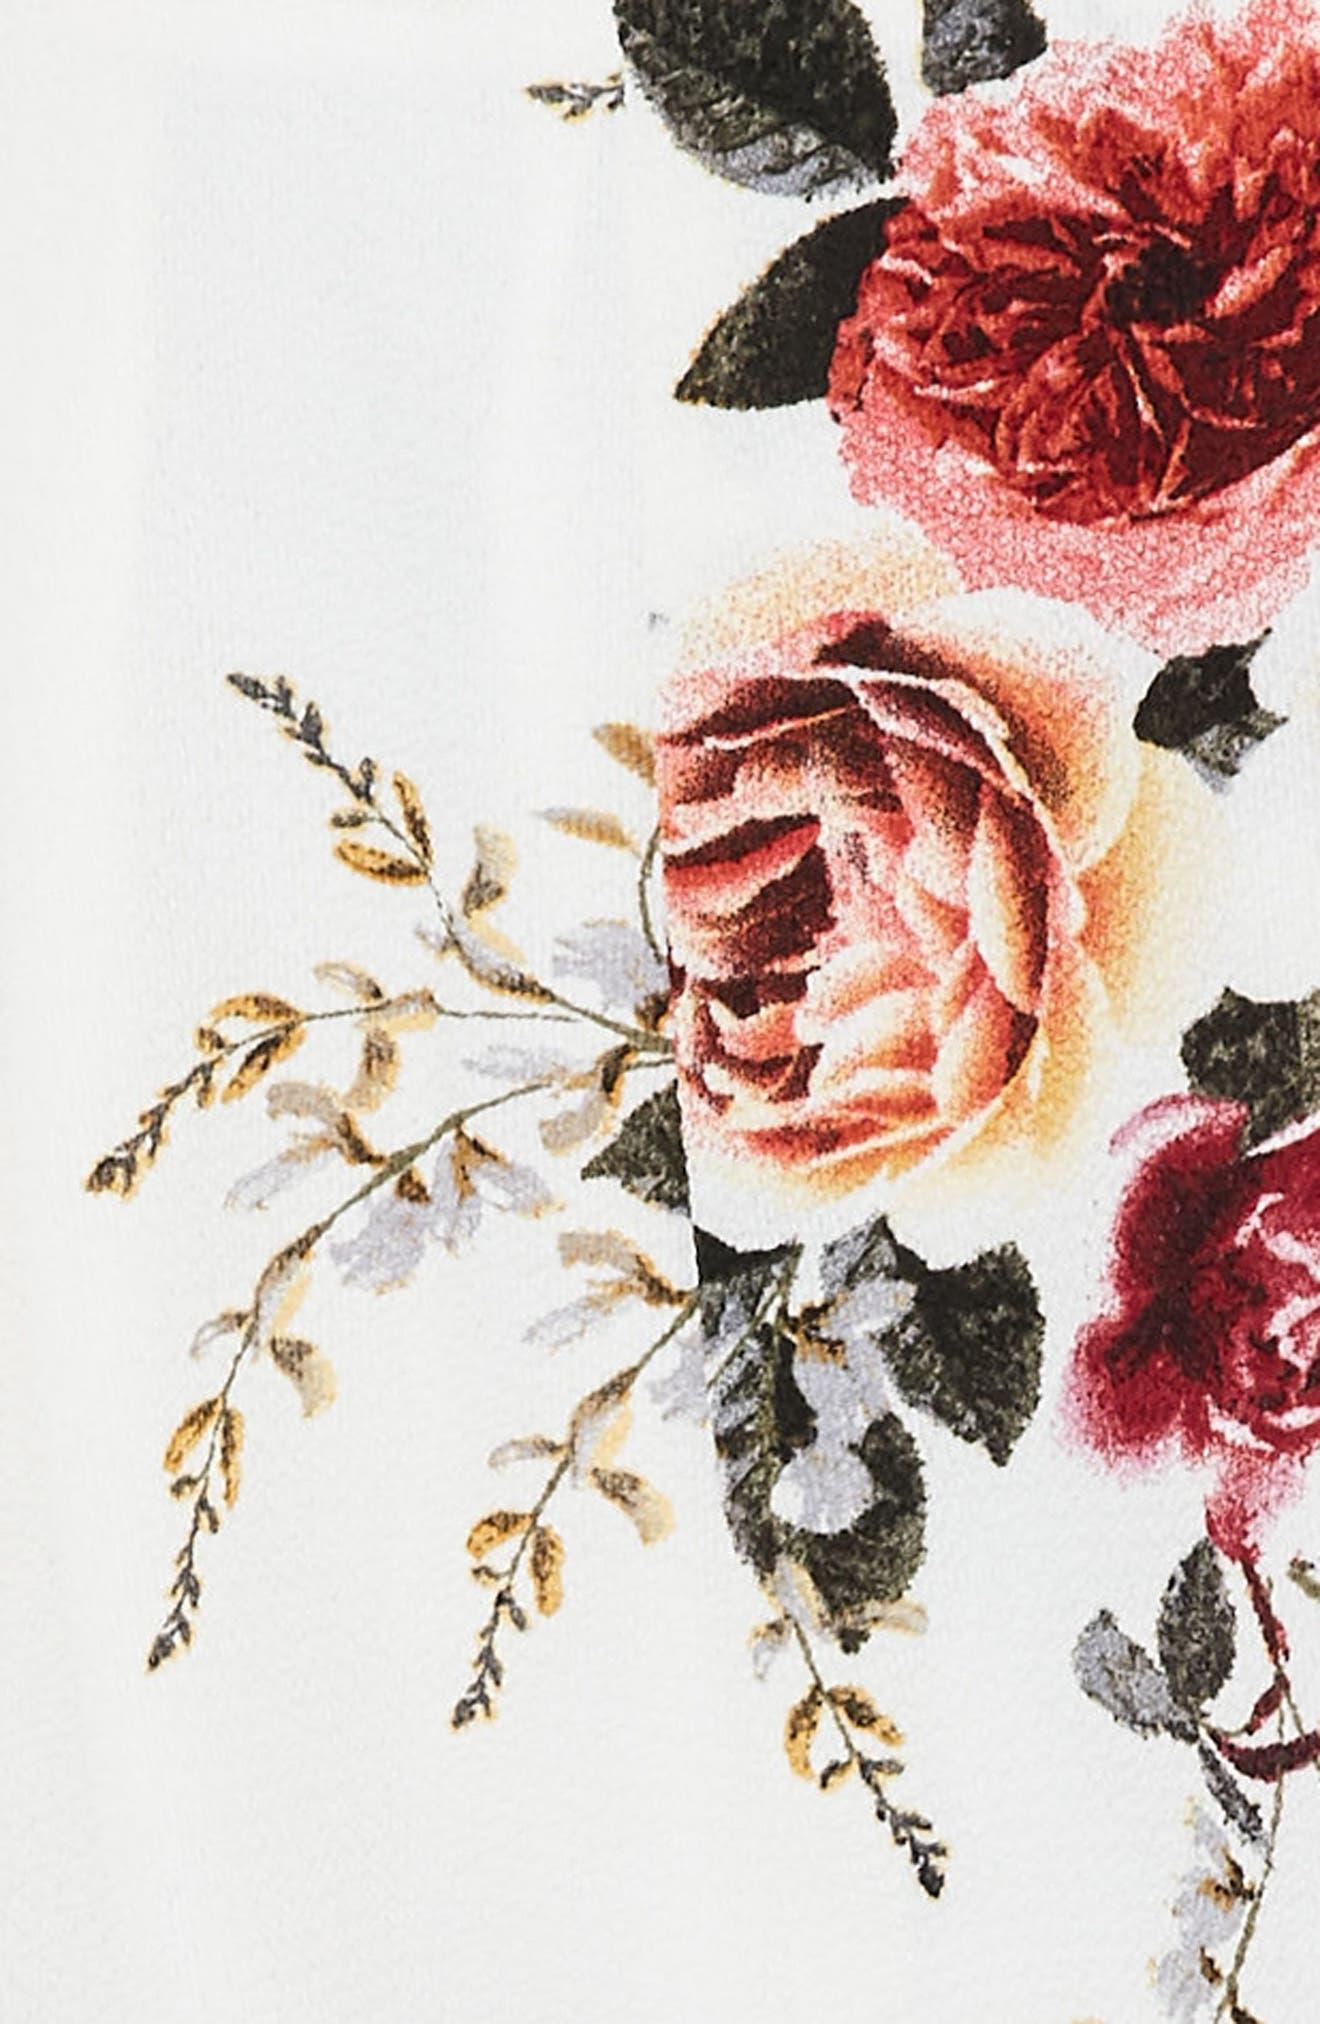 Floral Print High Waist Shorts,                             Alternate thumbnail 3, color,                             903